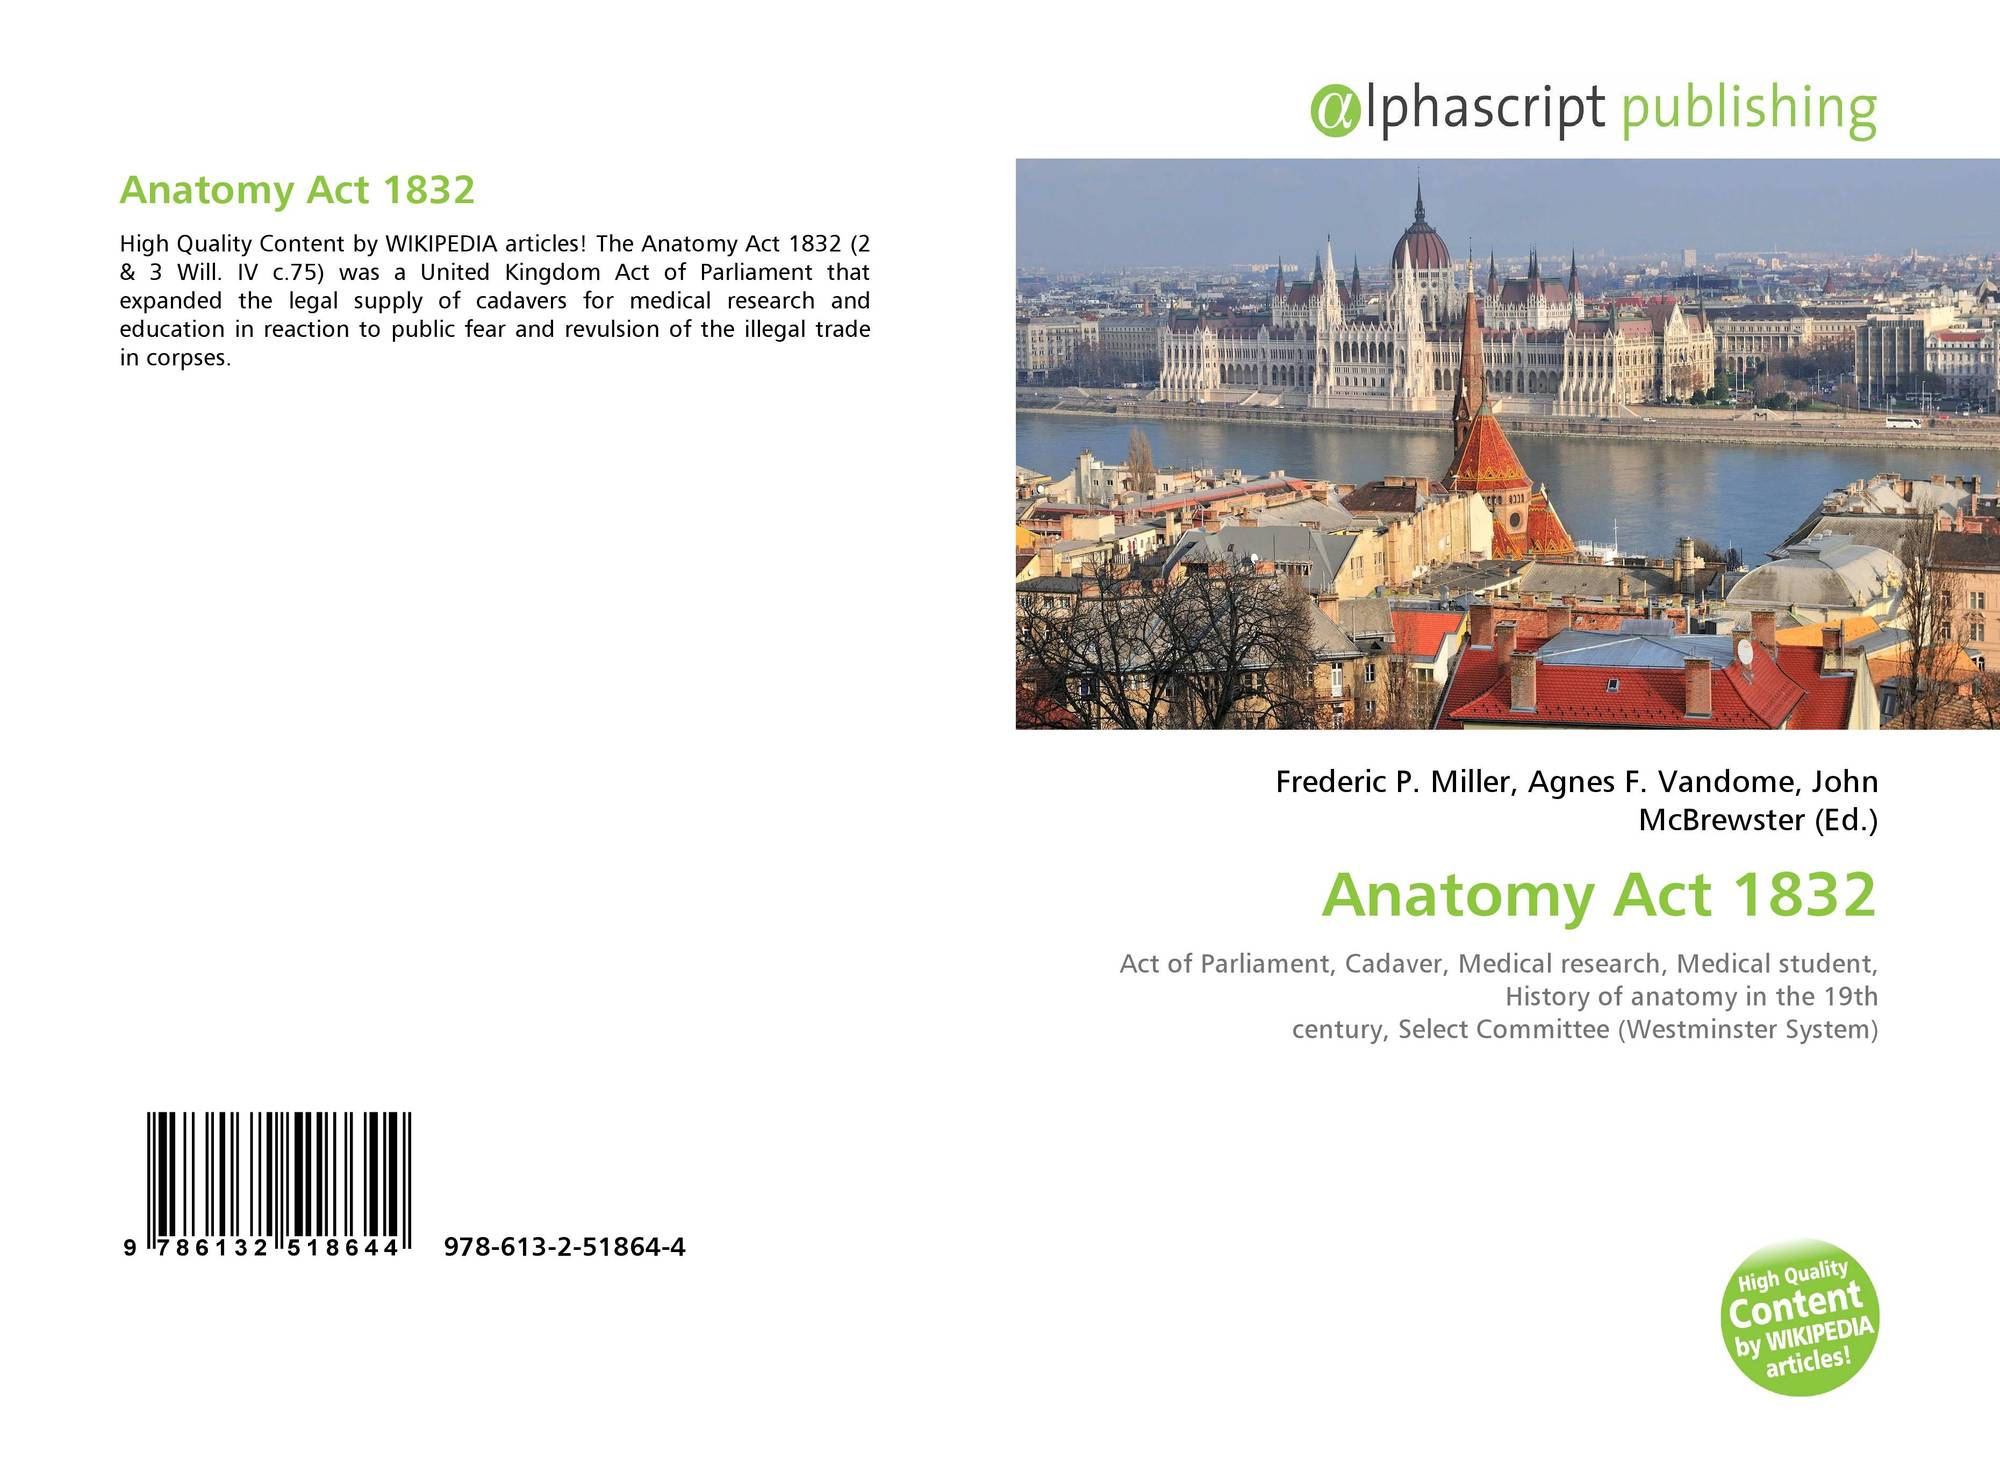 Anatomy Act 1832, 978-613-2-51864-4, 6132518649 ,9786132518644